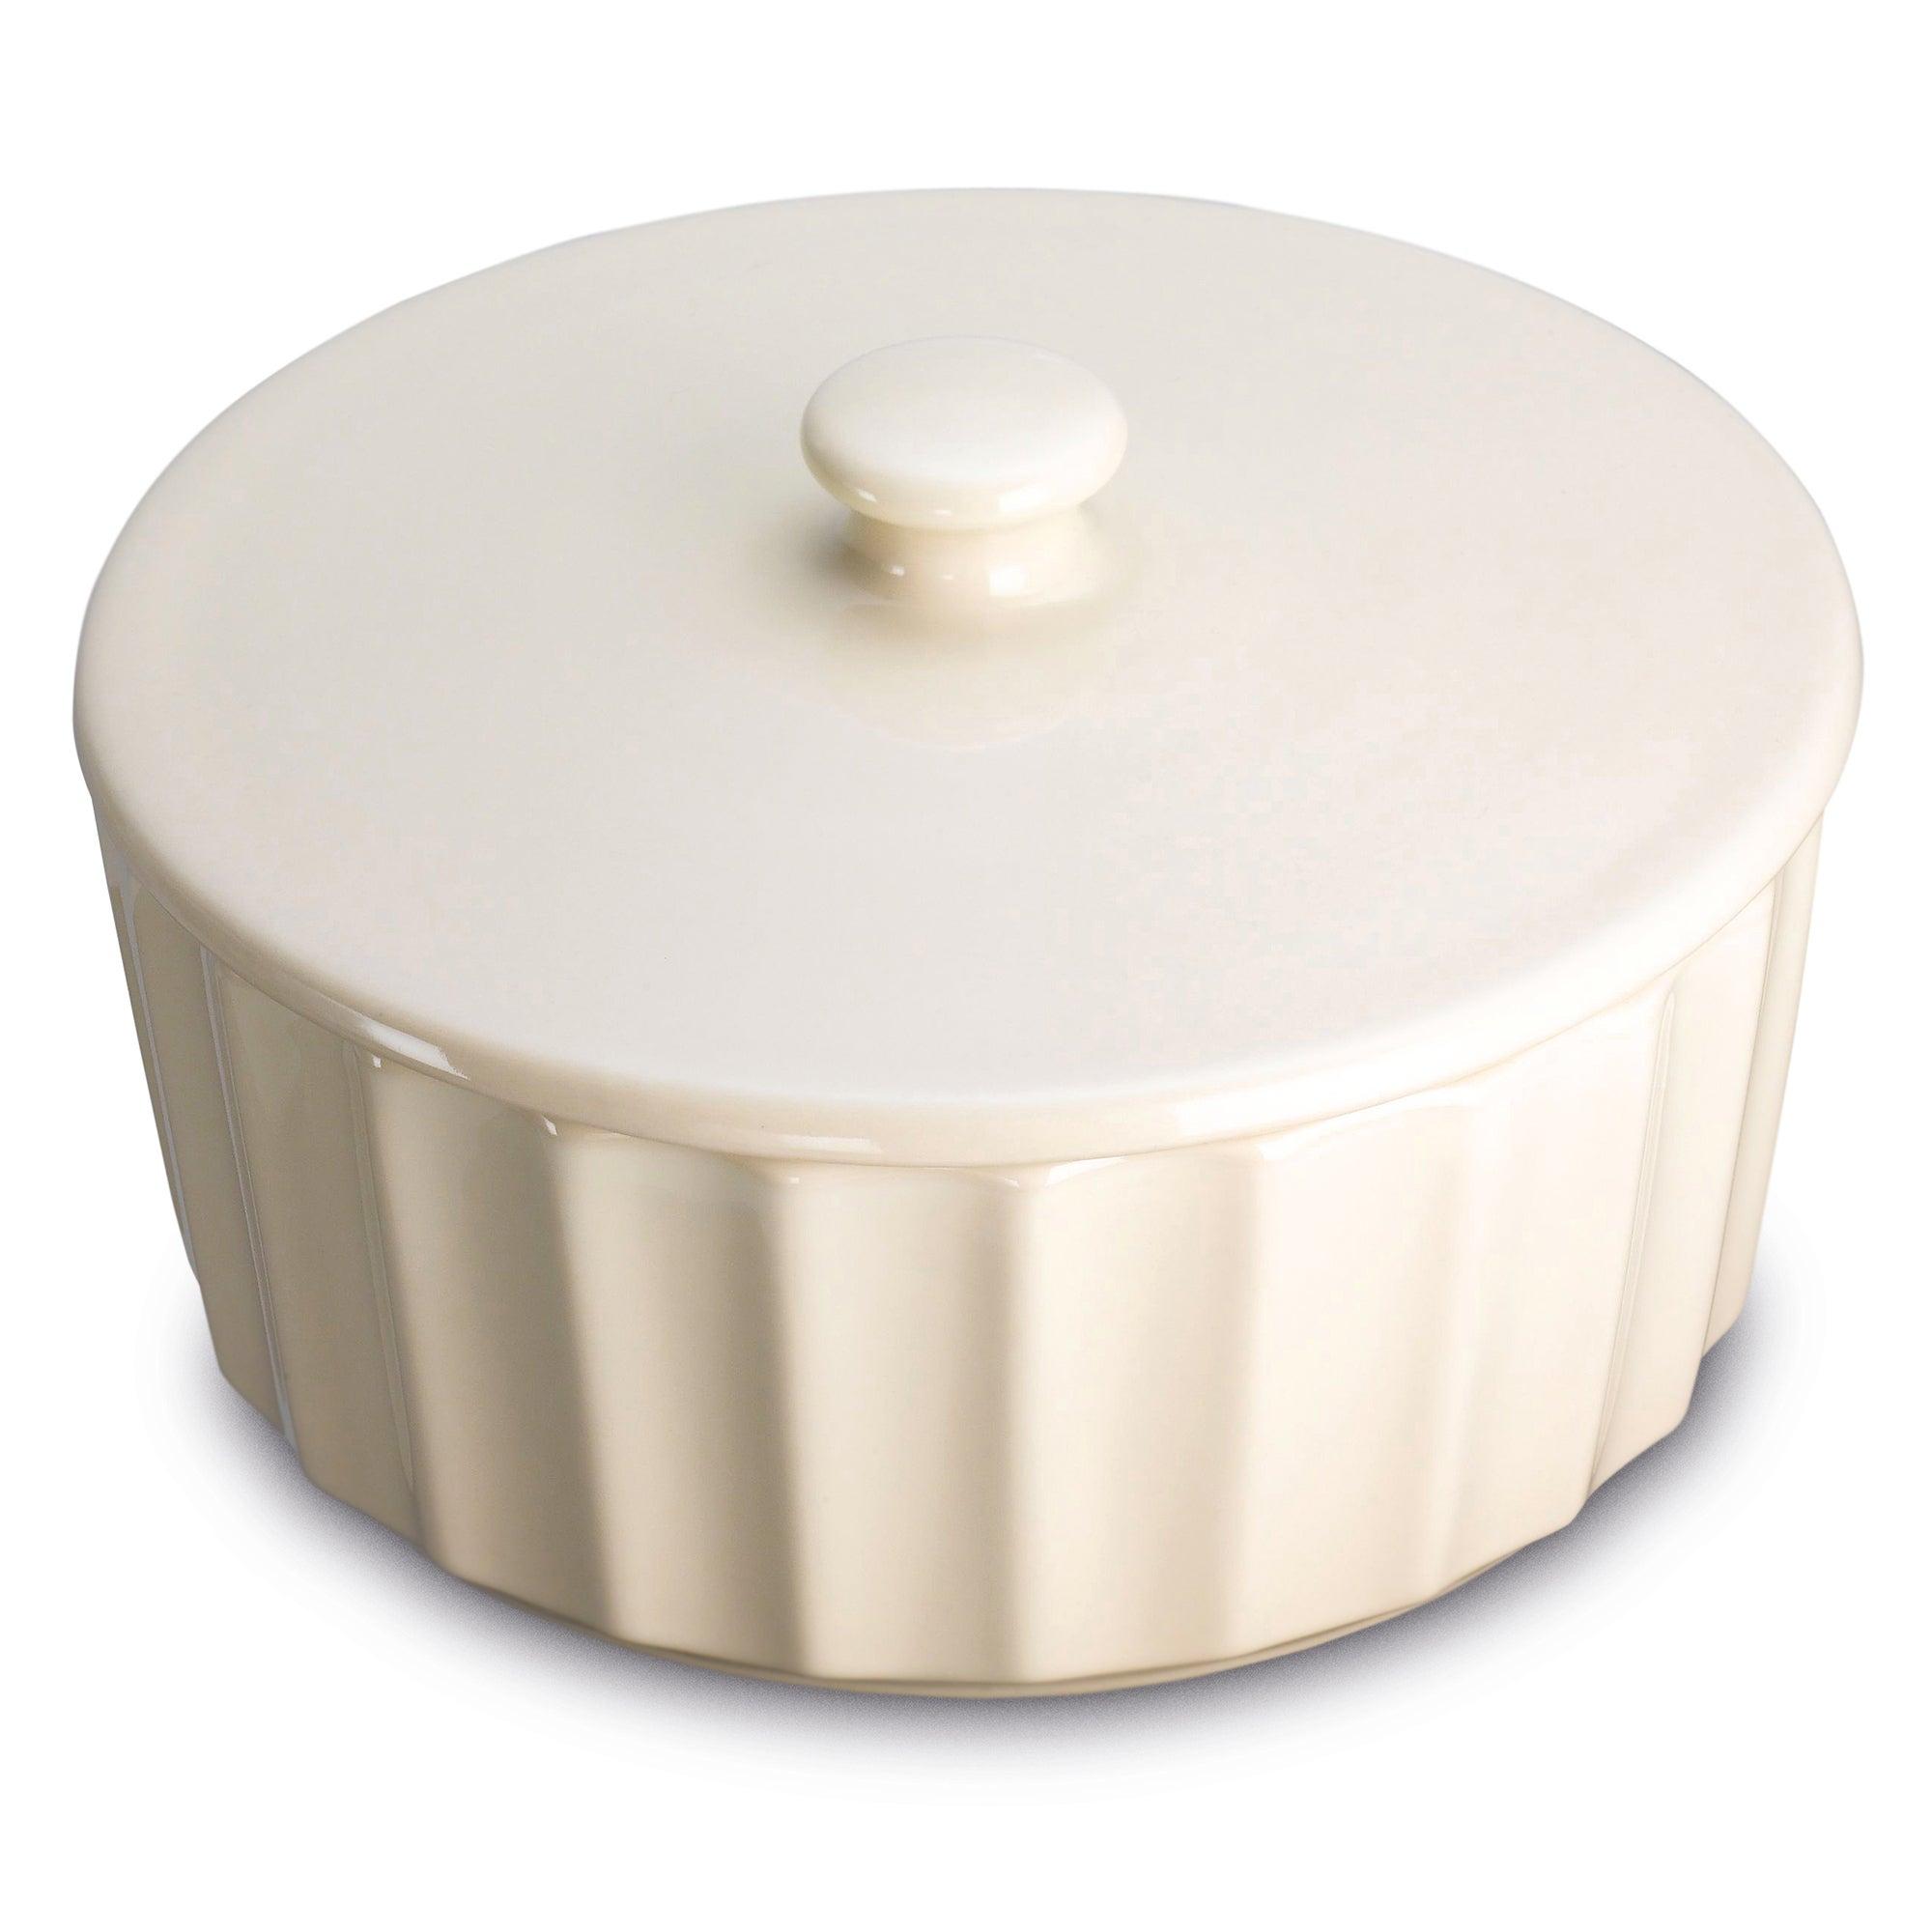 Prestige Create Almond Round Casserole Dish